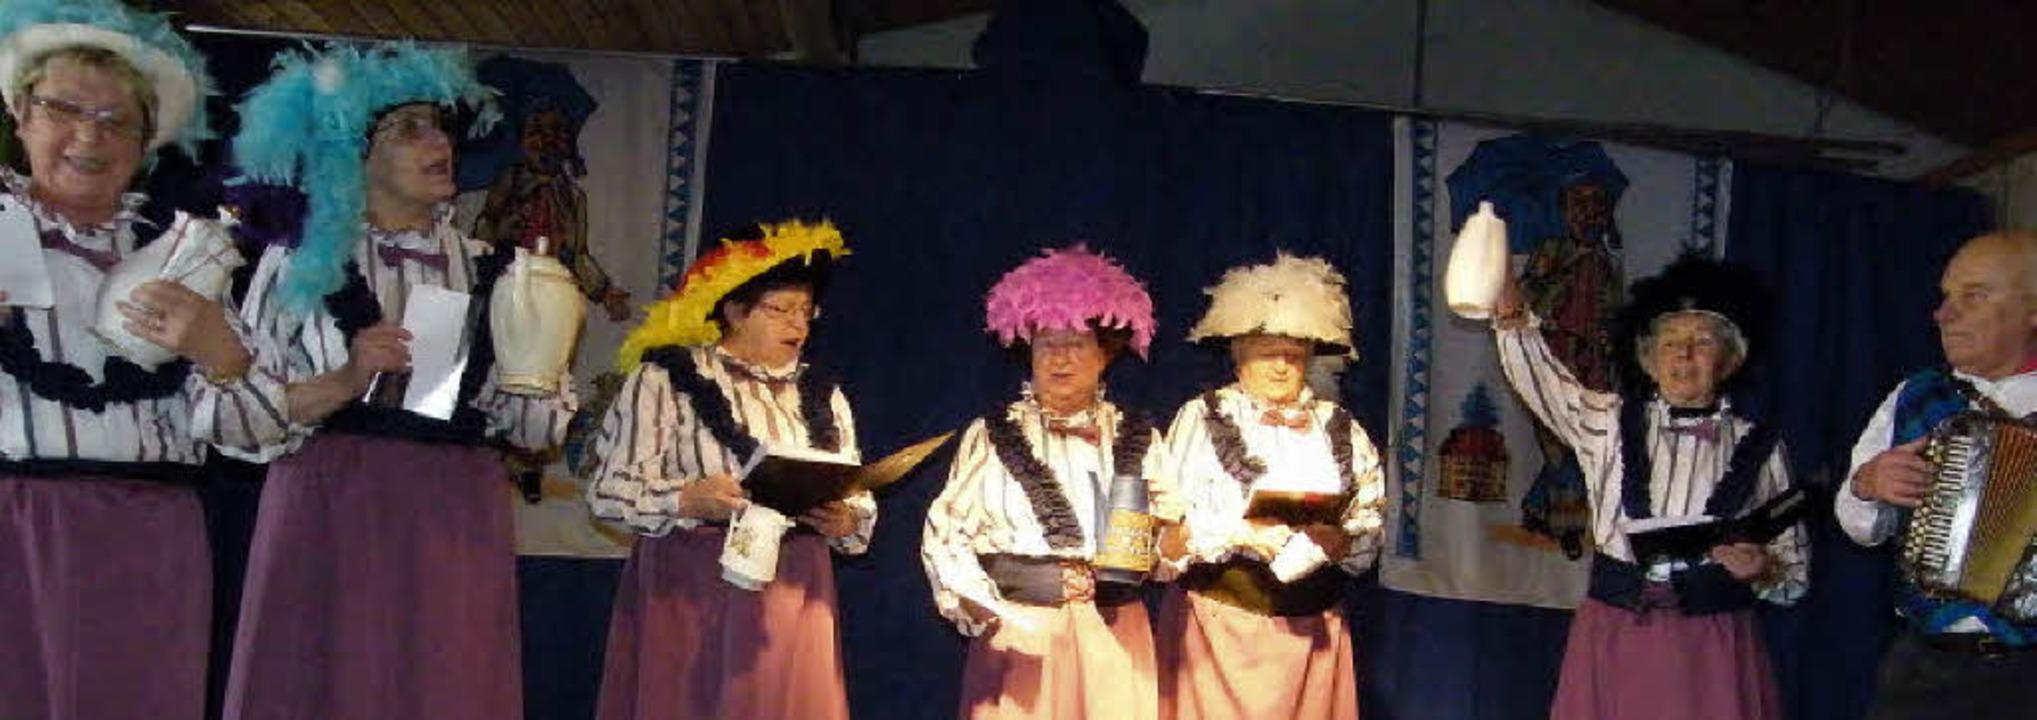 Irmtraud Brogle, Mechthild Morath, Mar...tschrunde mit Original Herbert Fitzke.  | Foto: Martha Weishaar